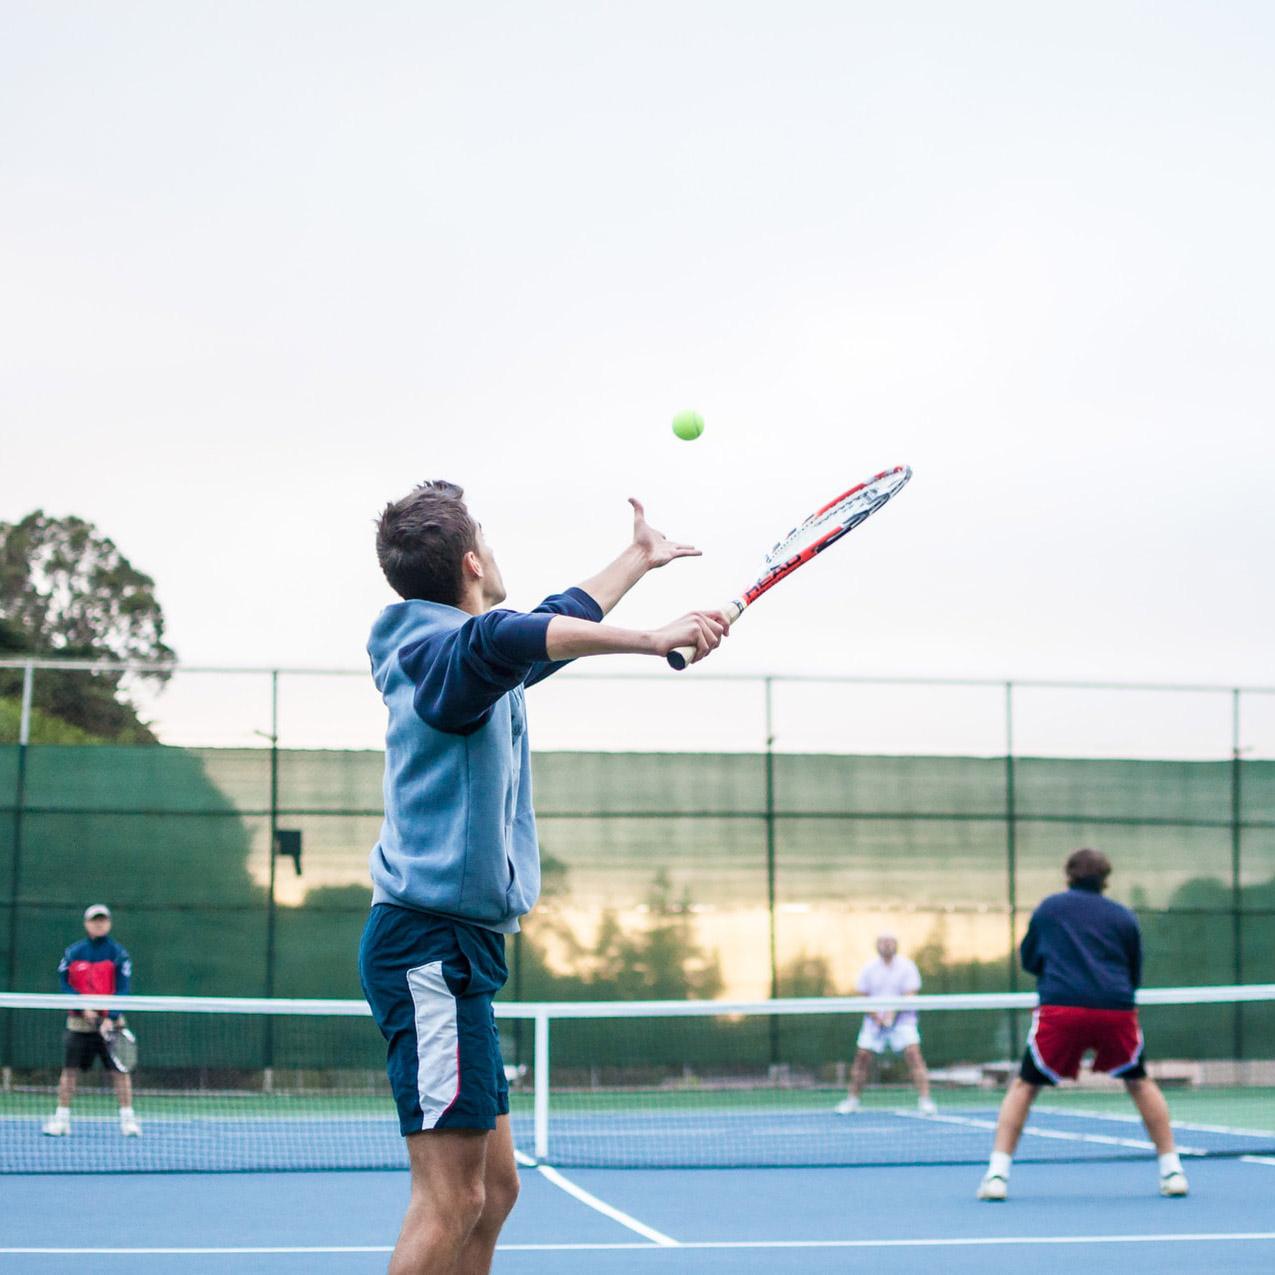 testosterone optimization results trt tennis playing